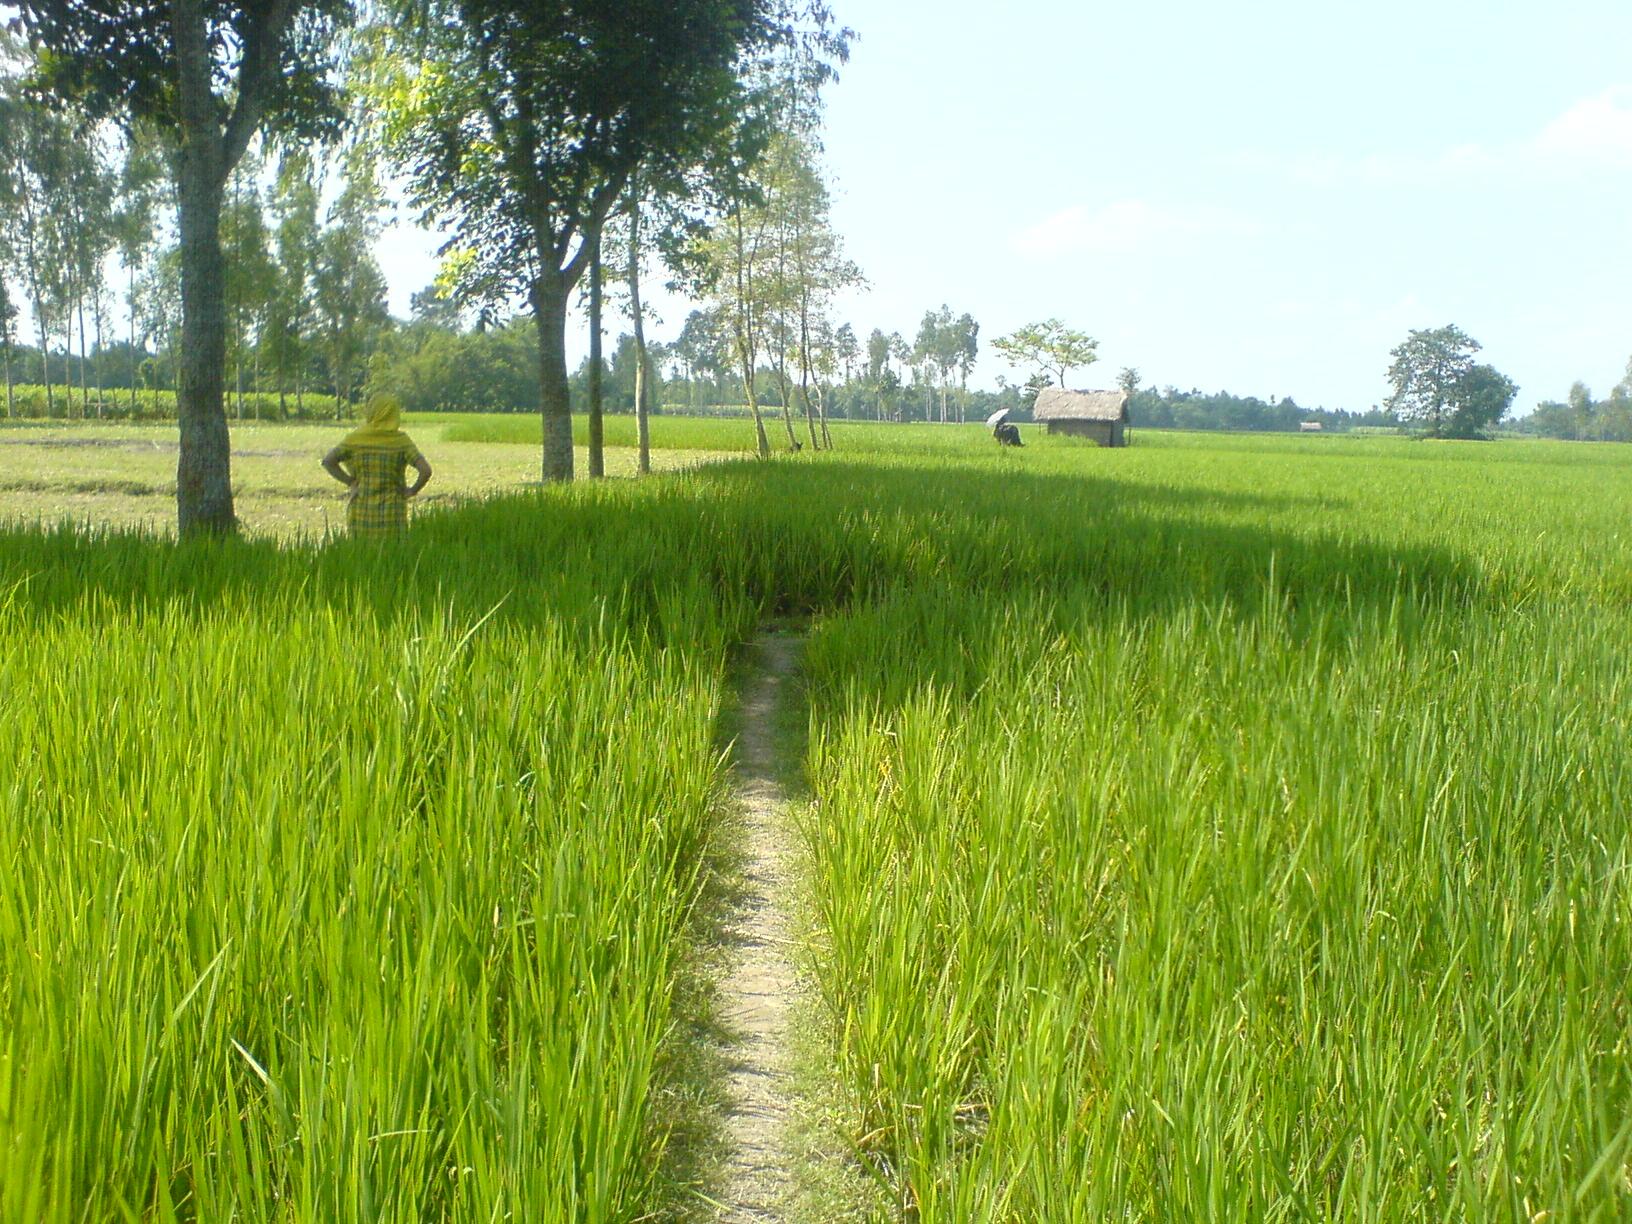 File:Green Field In Bangladesh.jpg